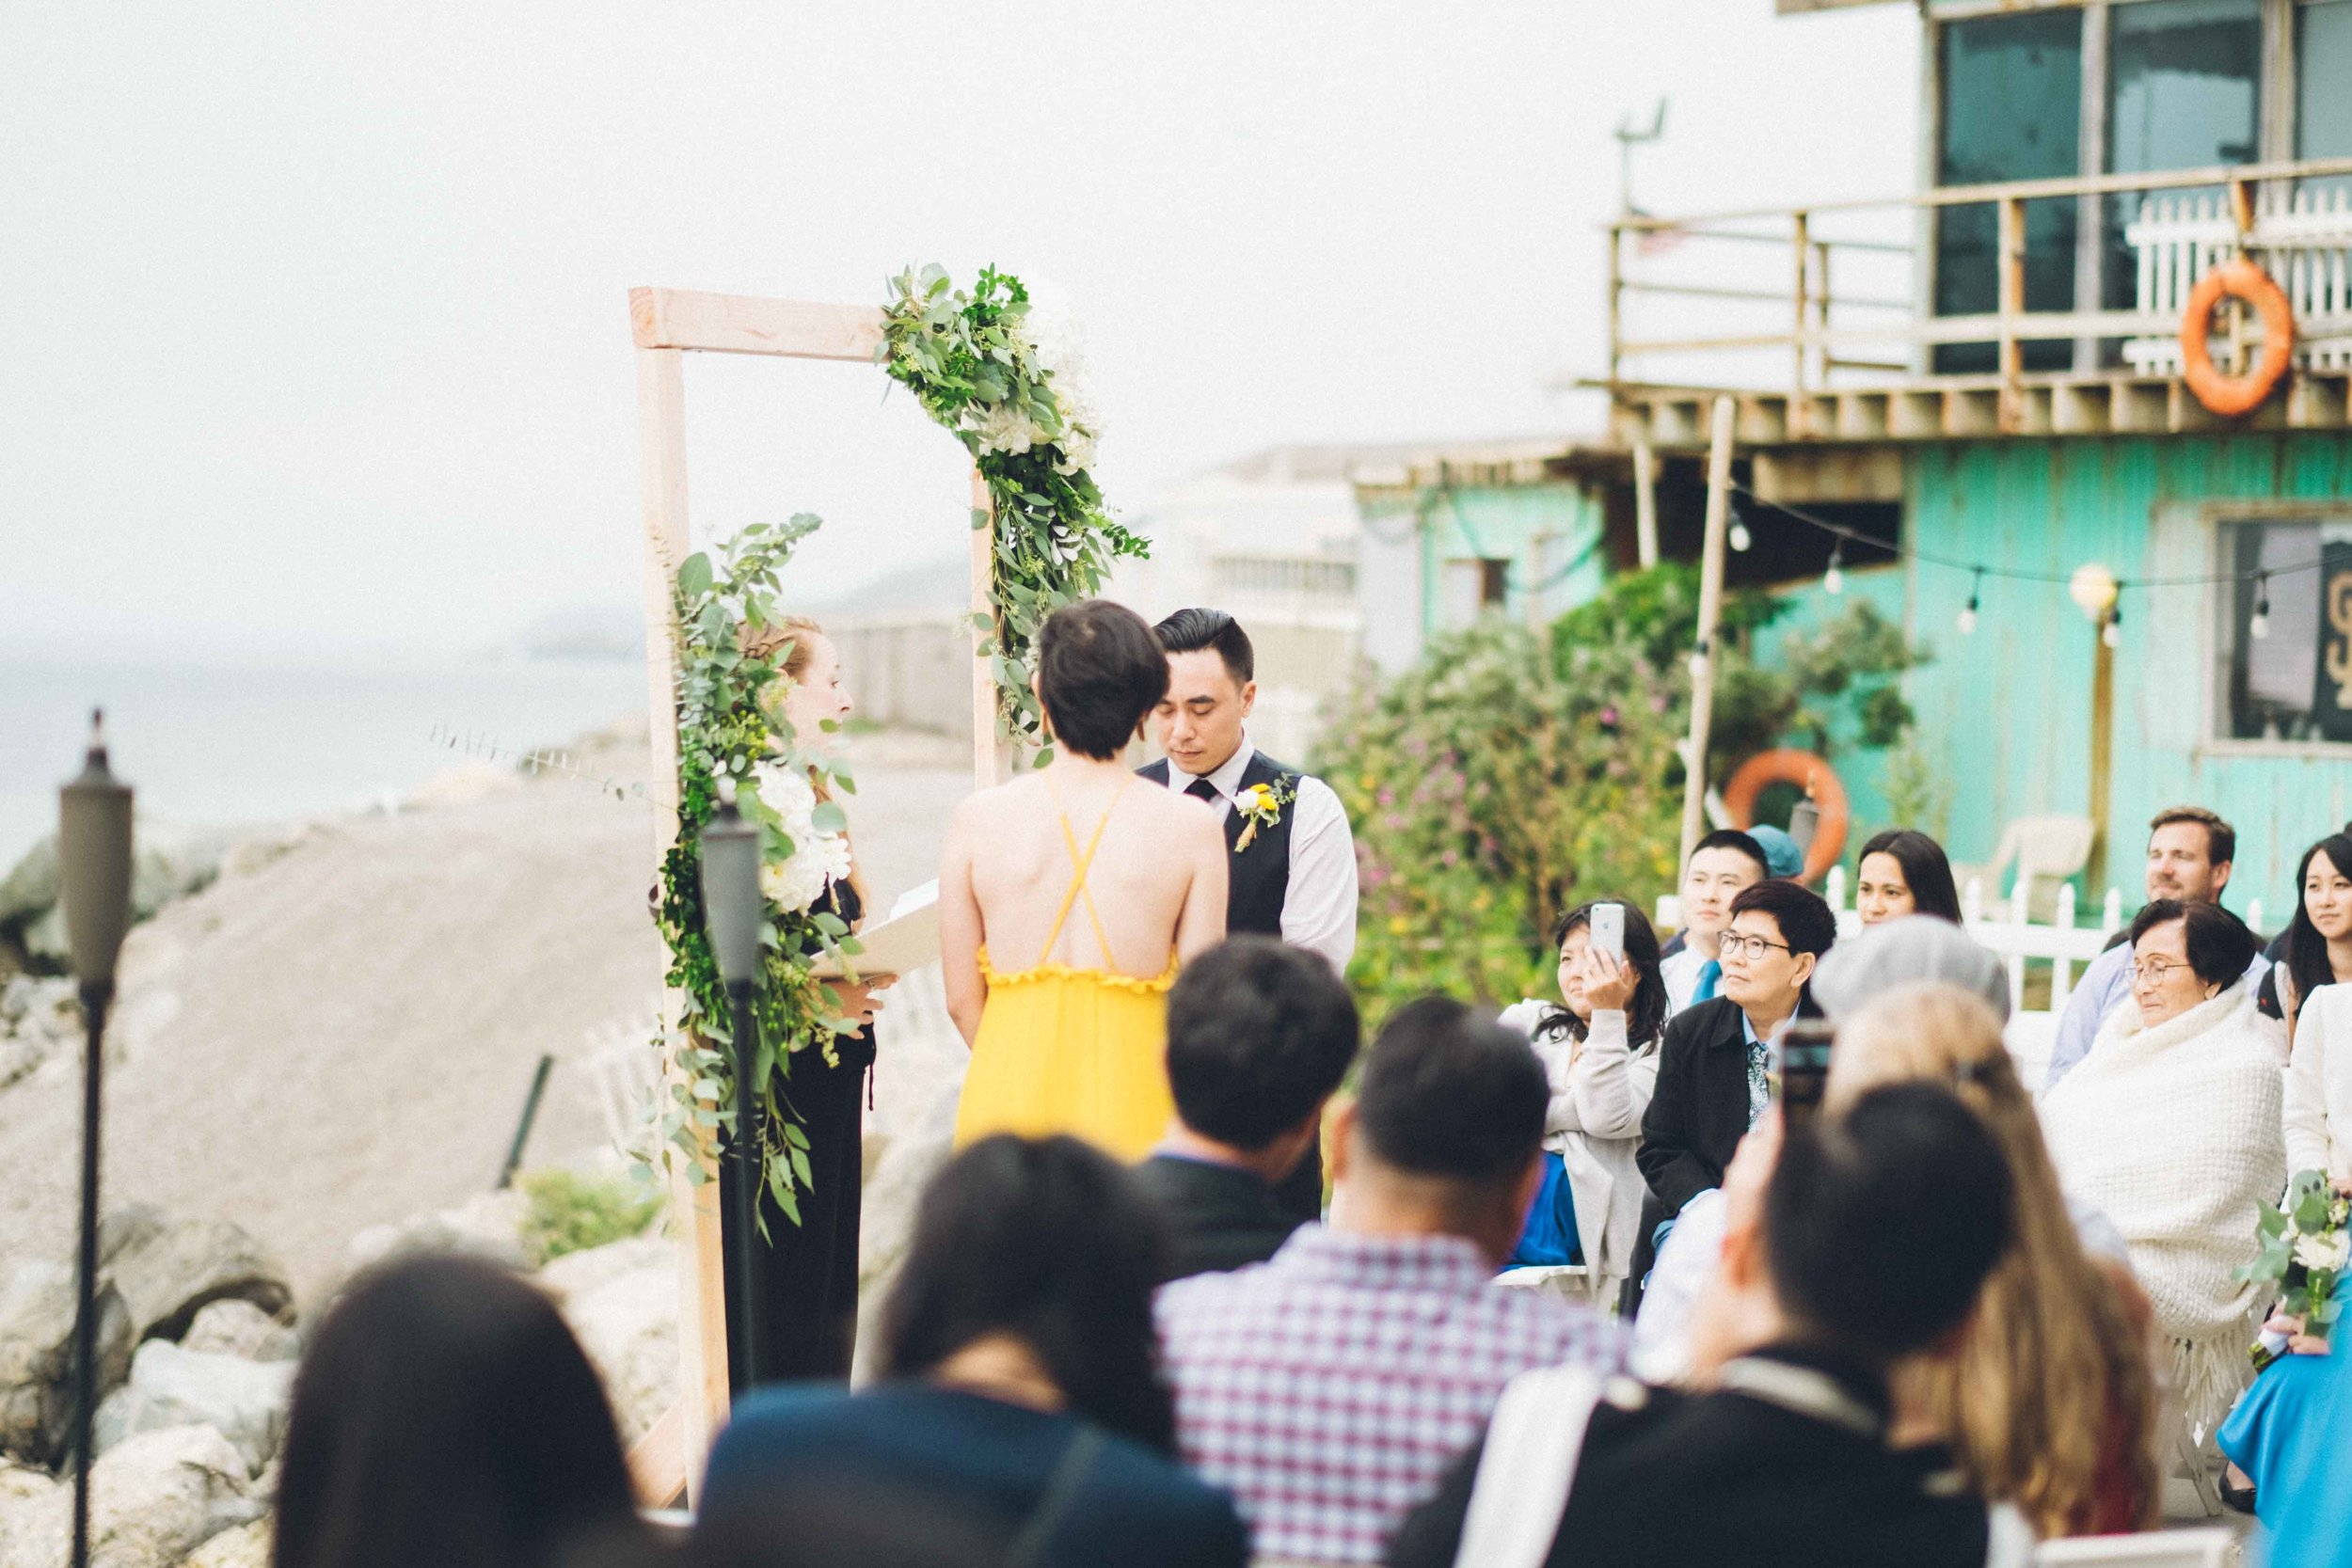 c-l-wedding-russell-rabanal-6621.jpg